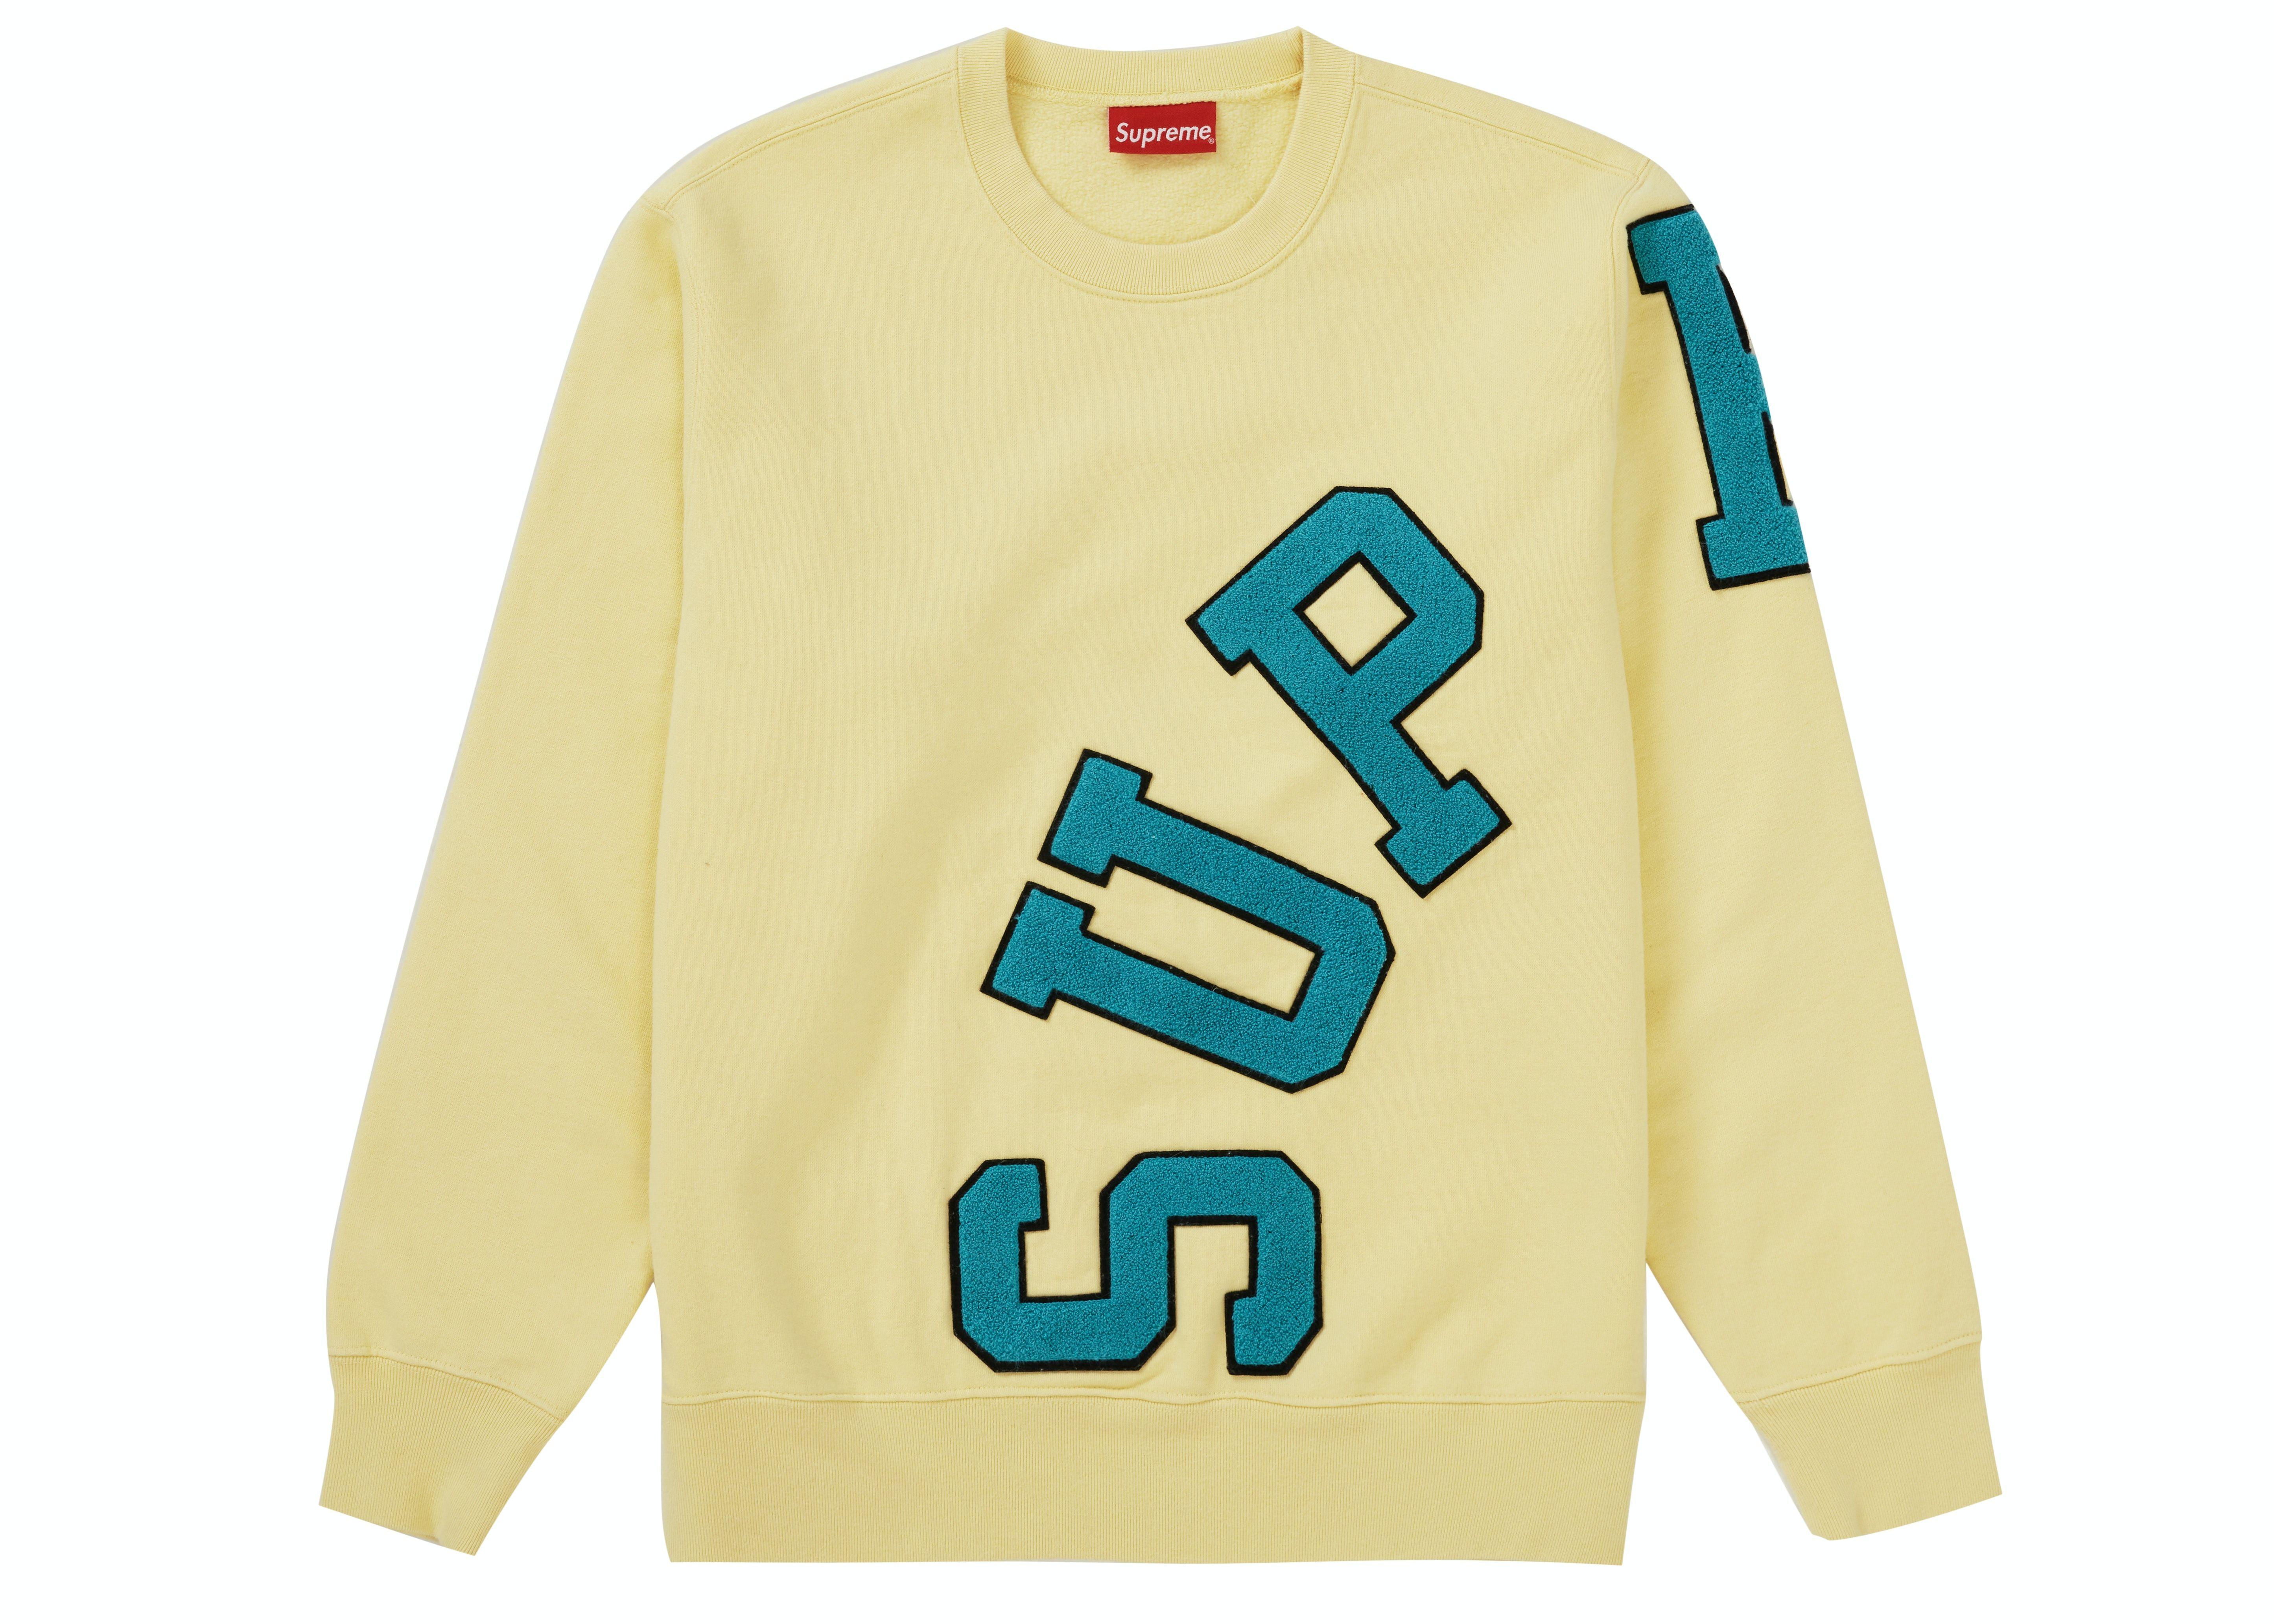 Supreme Big Arc Crewneck Light Yellow In 2021 Graphic Sweatshirt Crew Neck Sweatshirts [ 4130 x 5782 Pixel ]